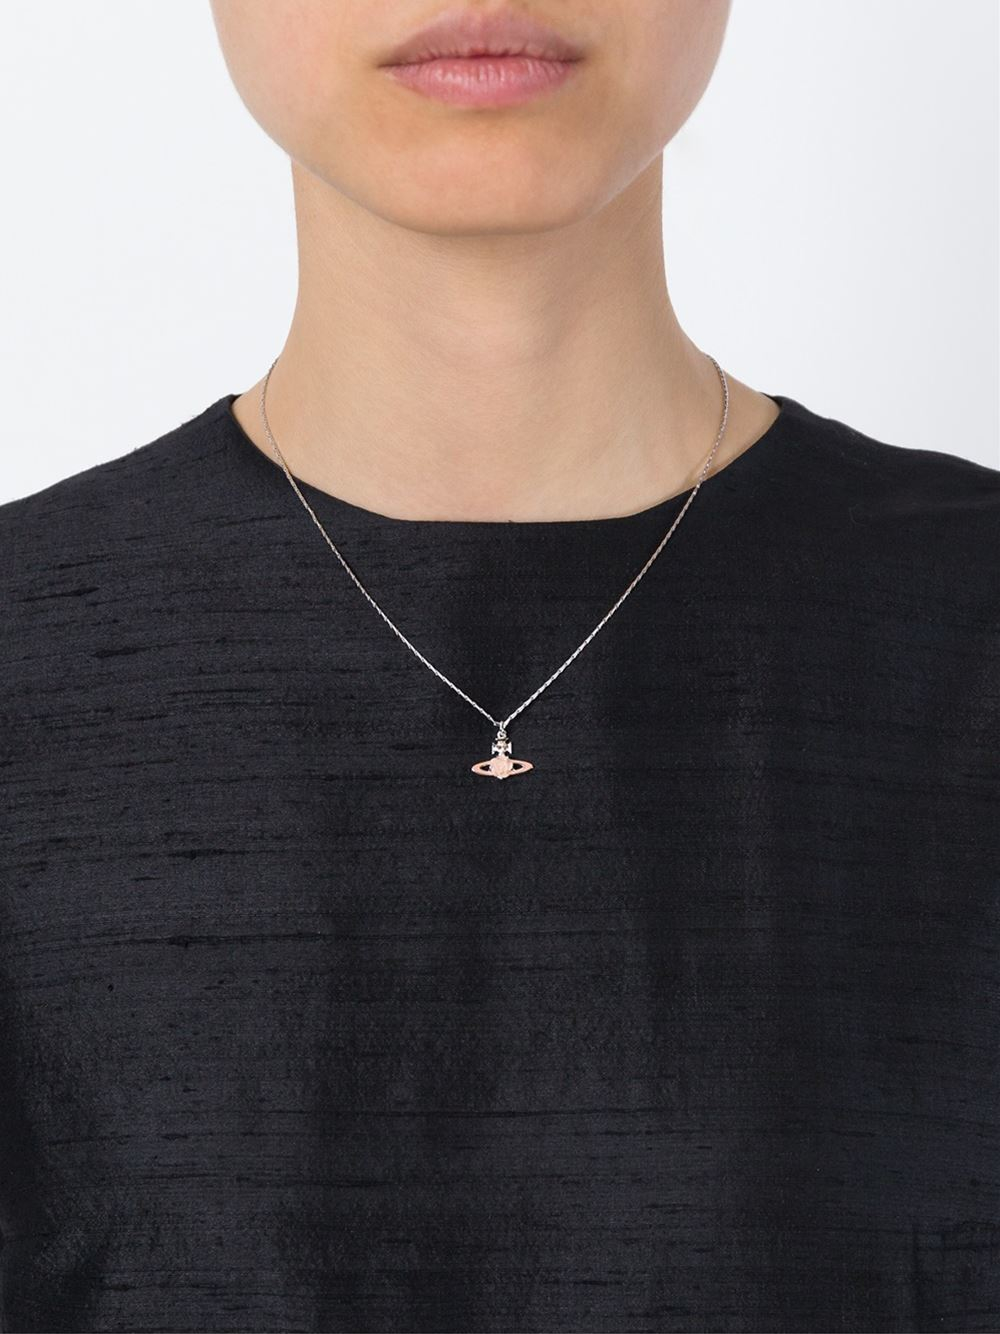 ba4ced378781b3 Vivienne Westwood Flower Orb Pendant Necklace in Pink - Lyst